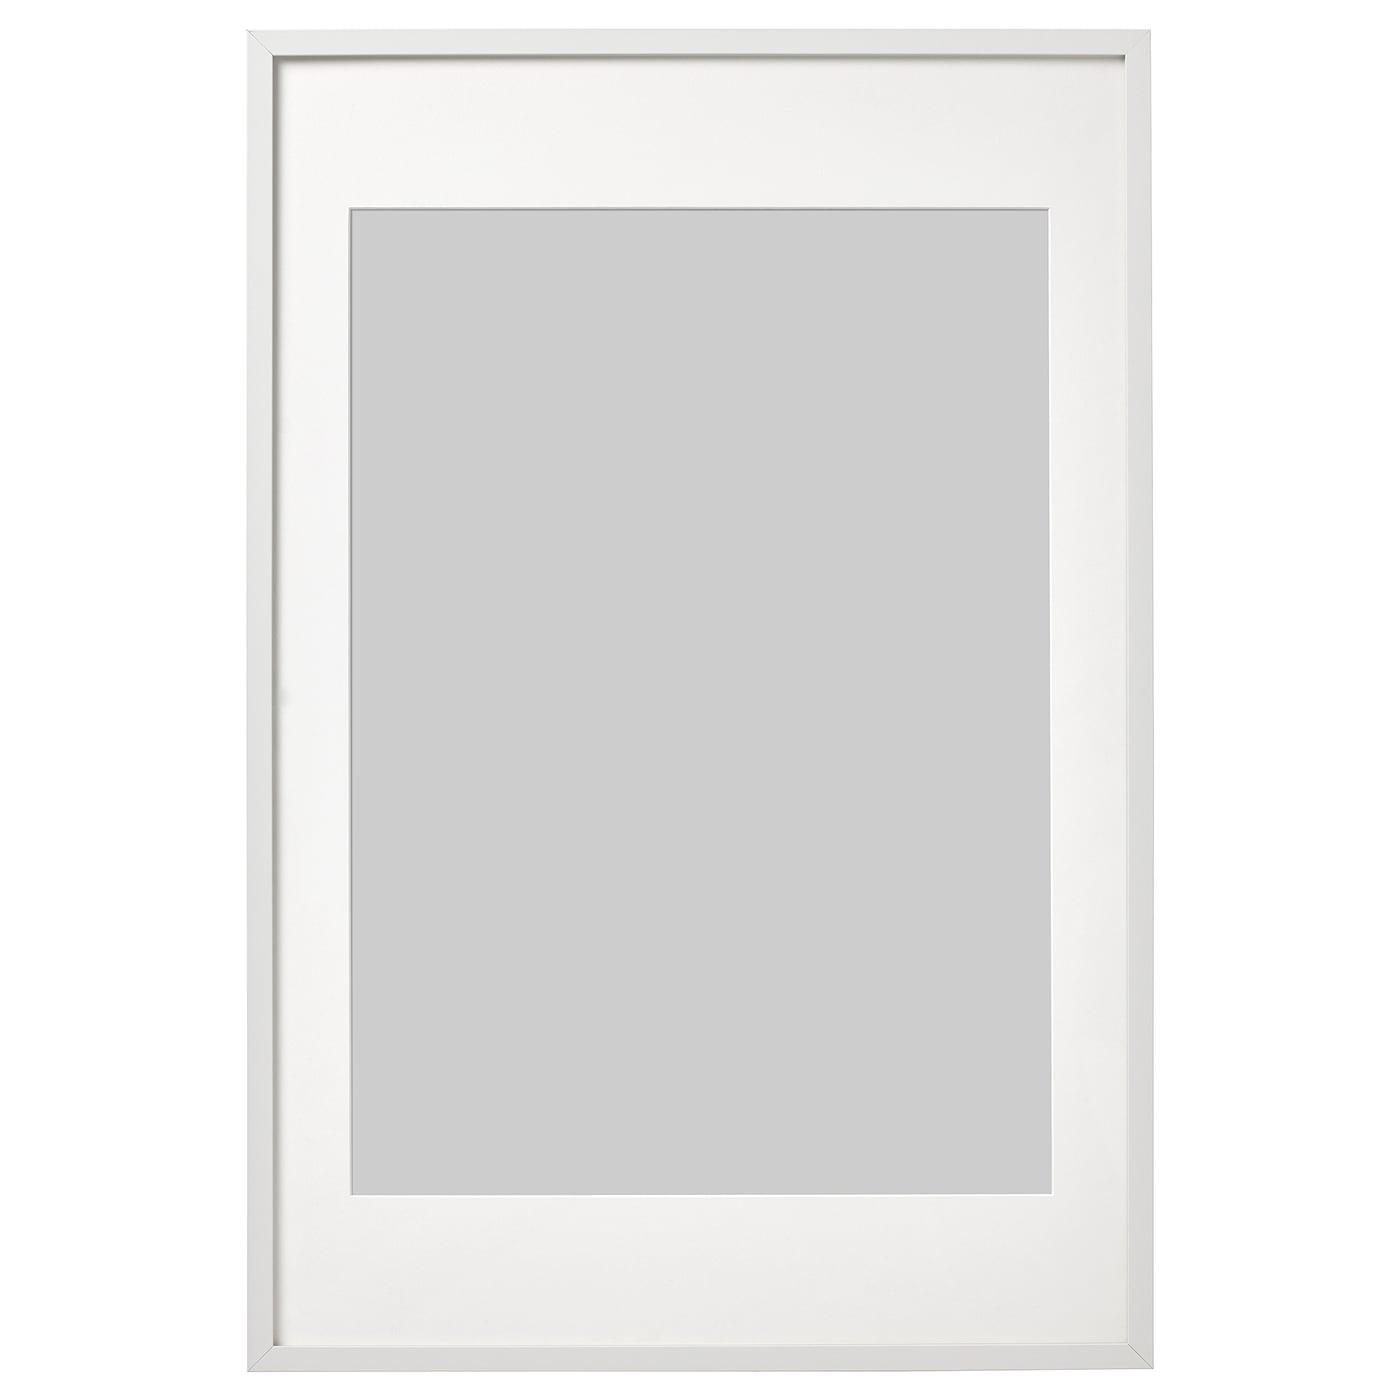 Ribba Frame White 24x35 Ikea